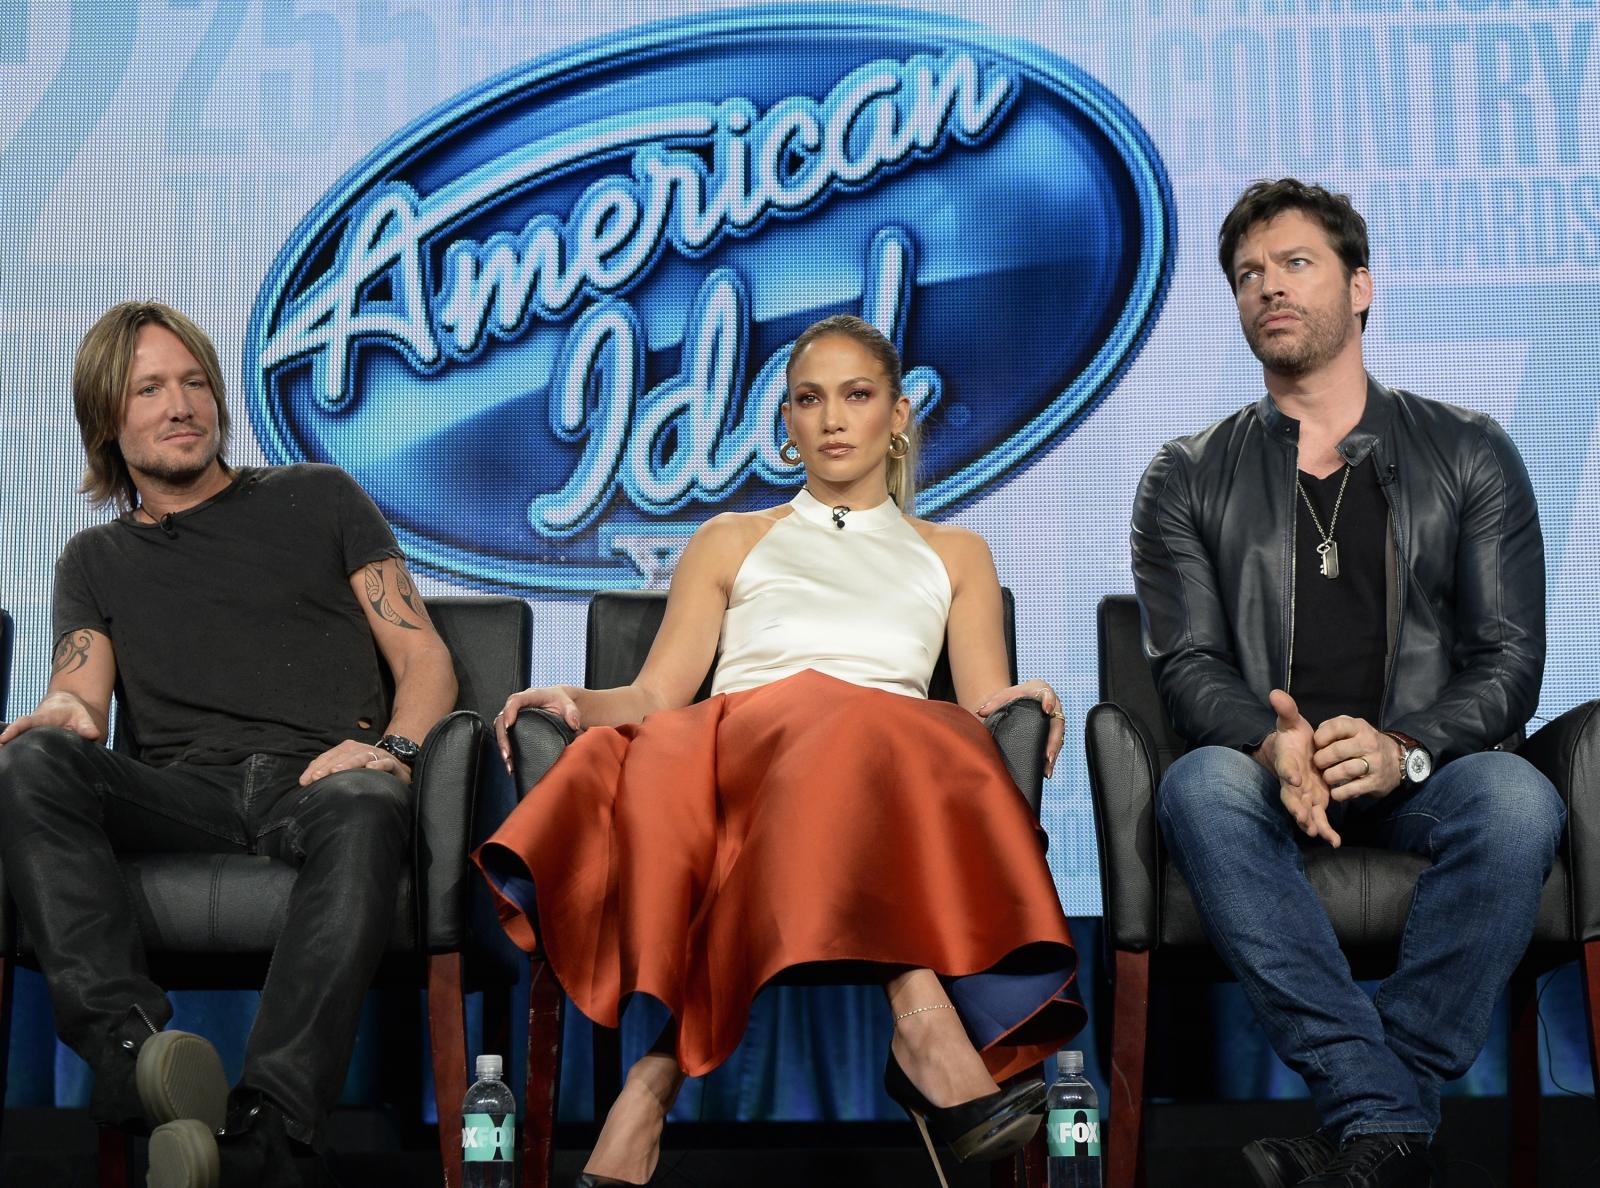 American Idol Contestants From North Carolina - TripSavvy